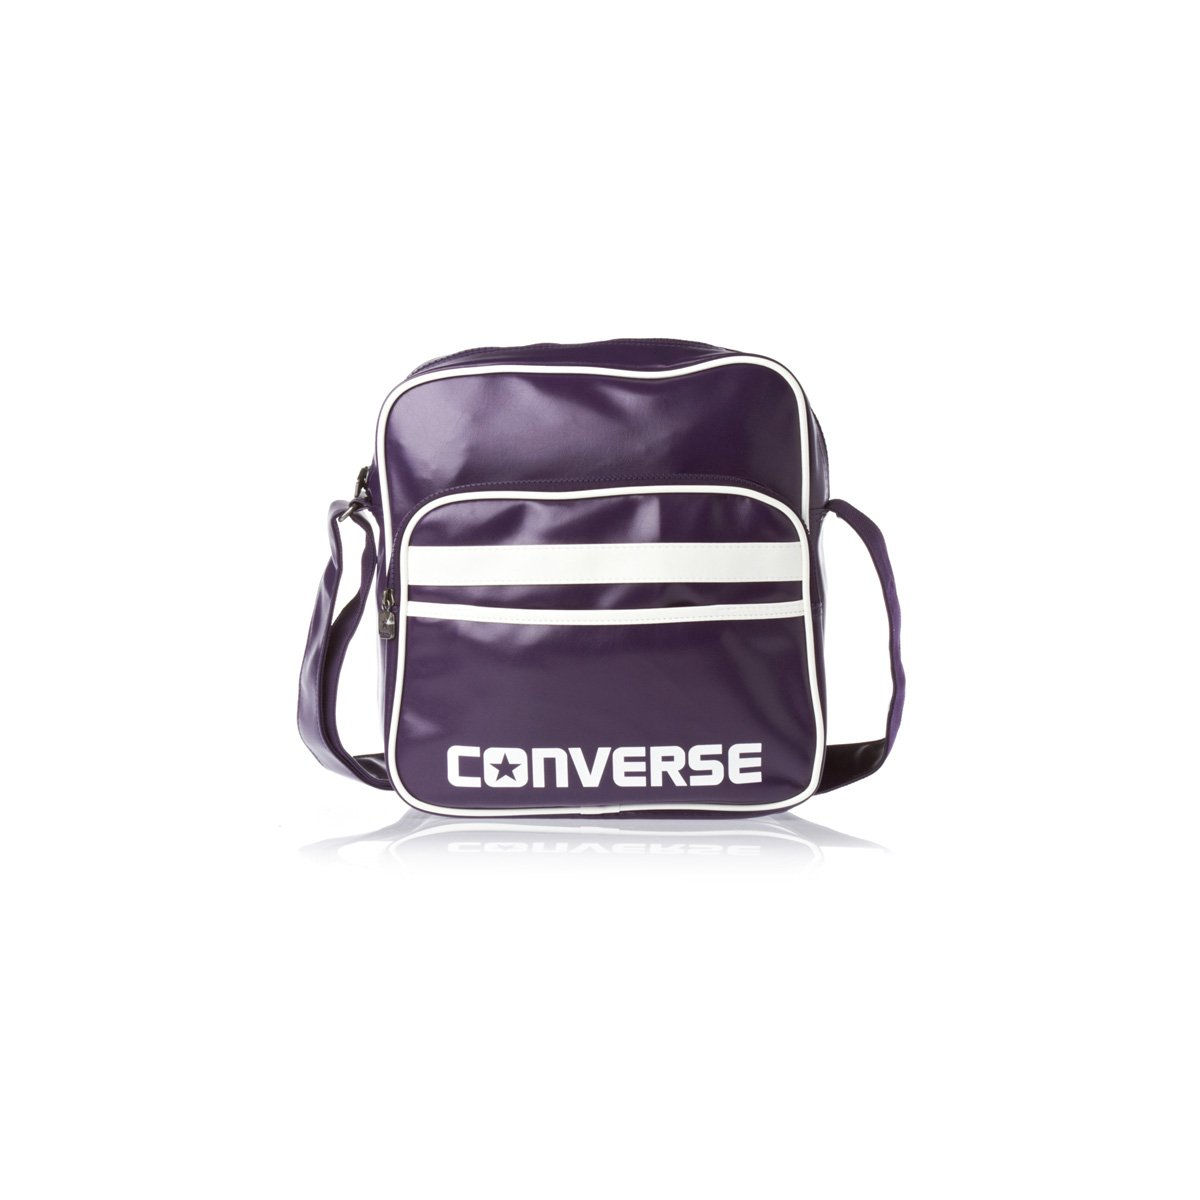 0814455267d7 Converse breakaway tourney airliner bag purple messenger flight bag luggage  jpg 1200x1200 Converse airliner bag